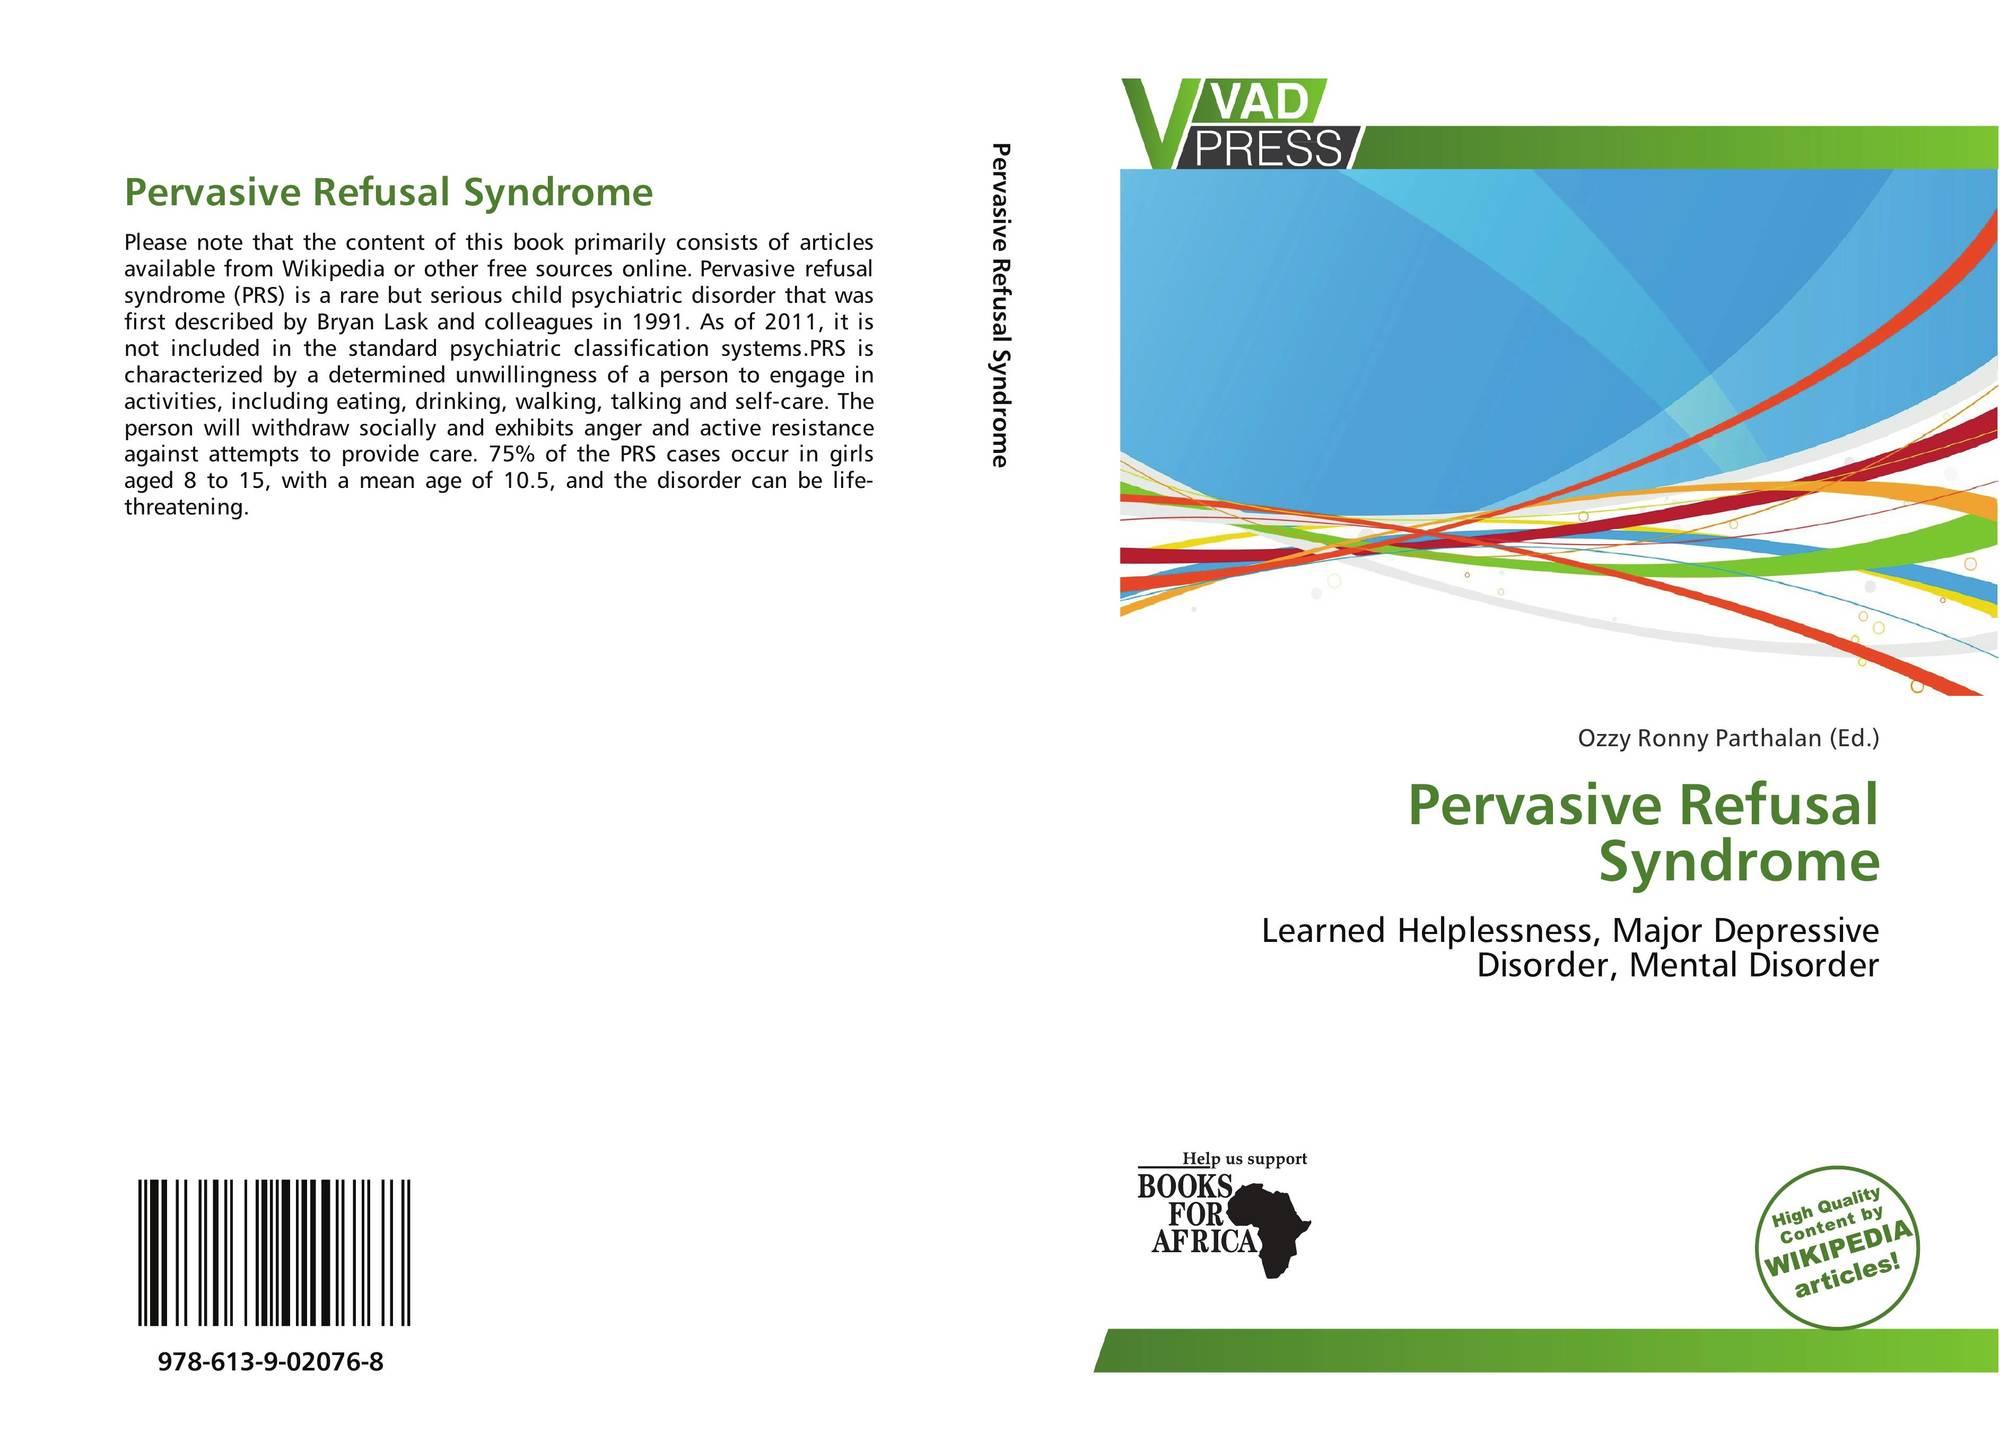 pervasive refusal problem circumstance studies